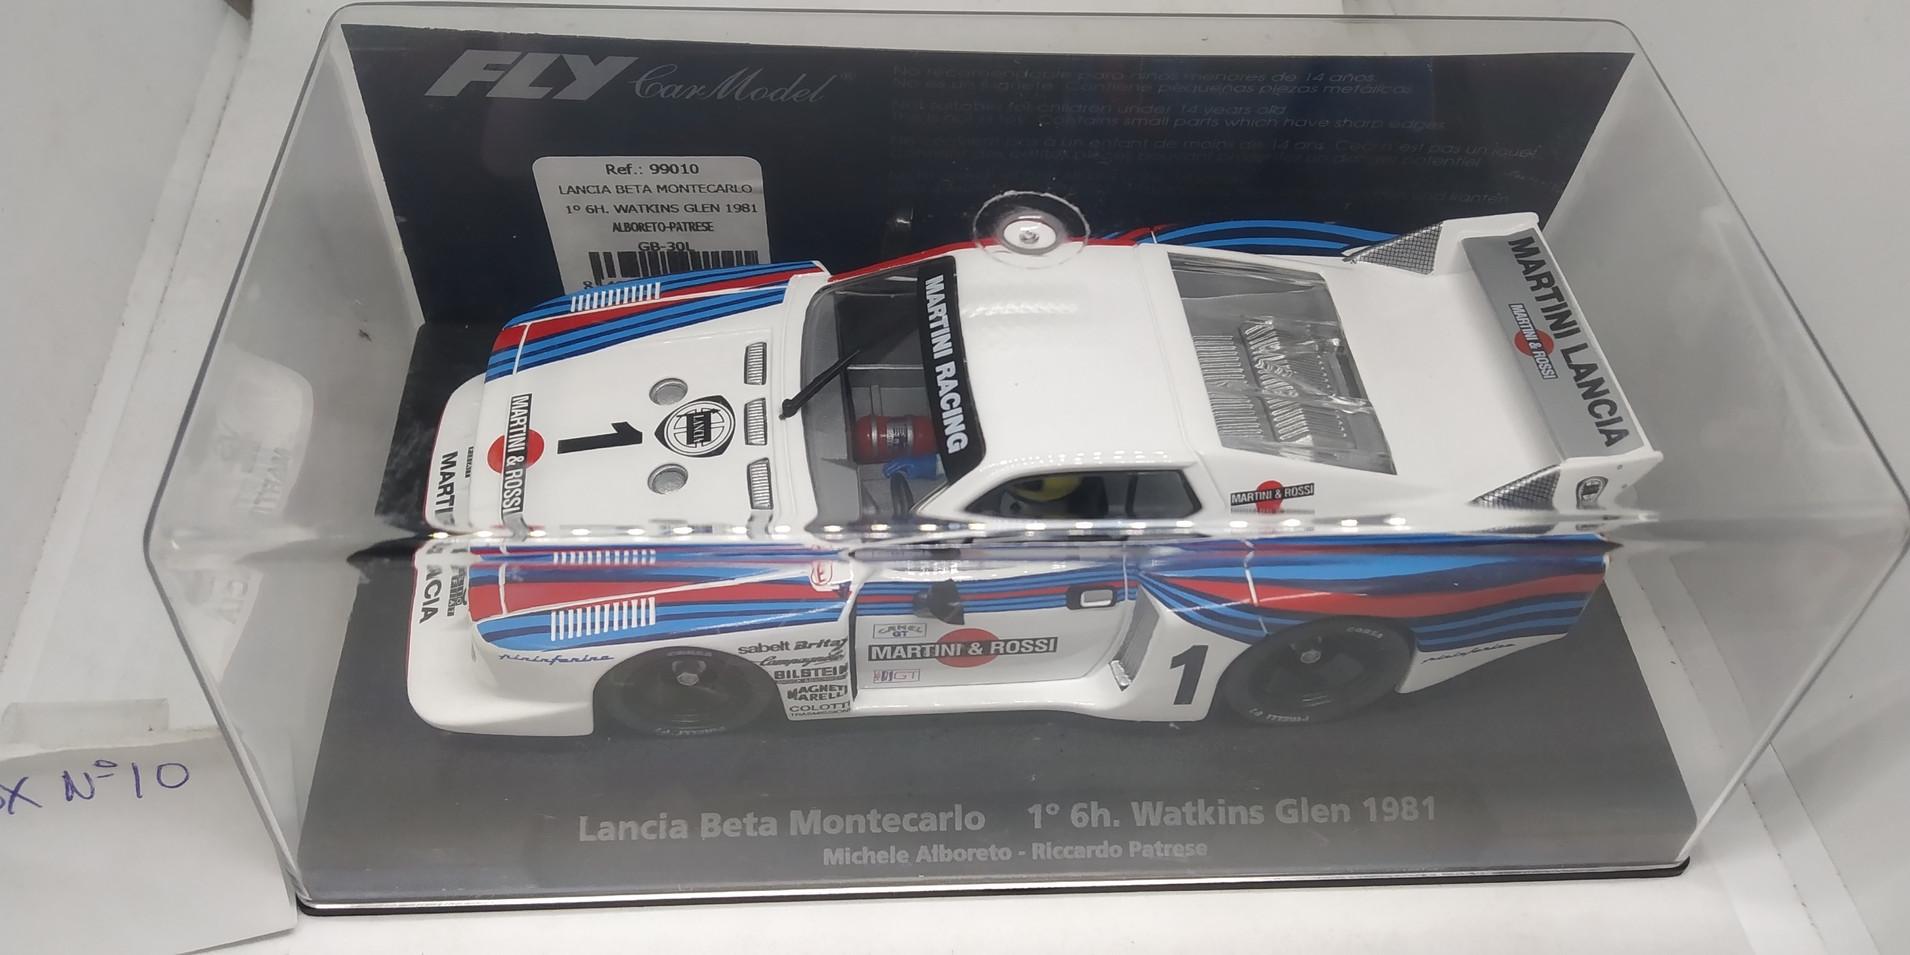 LANCIA BETA MONTECARLO 1º6H. WATKINS GLEN 1981 ALBORETO-PATRESE REF.99010 FLY CAR MODEL